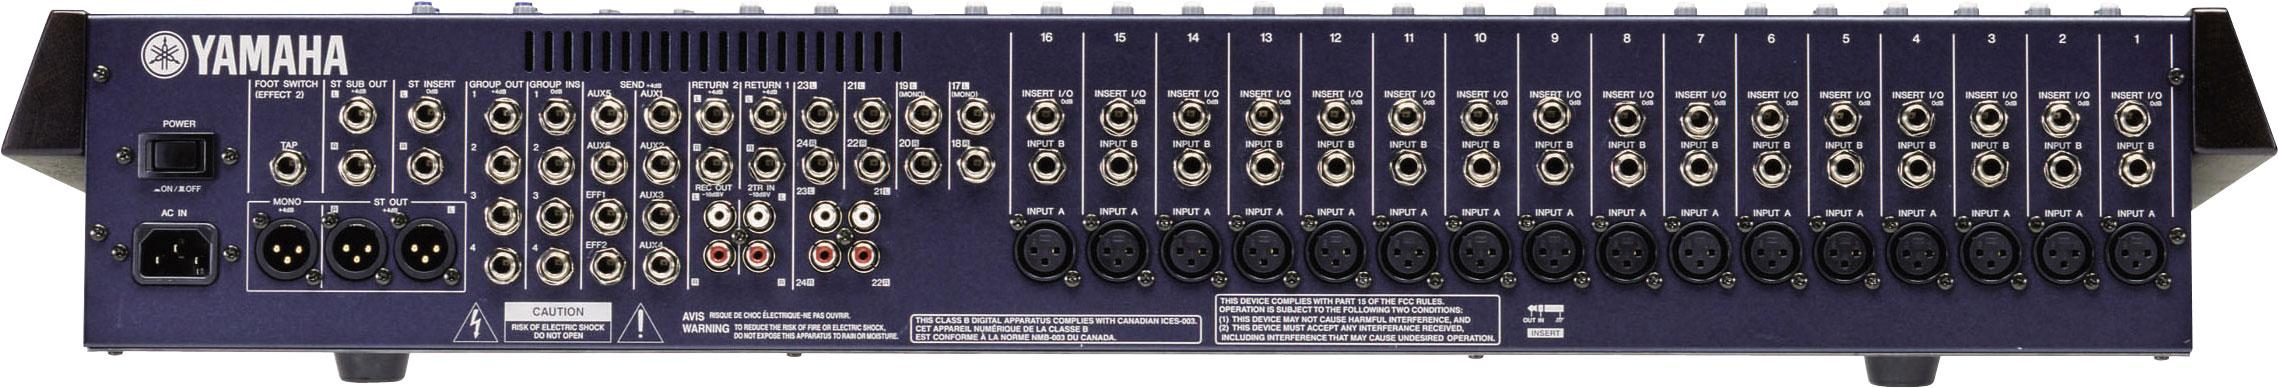 Yamaha Mg24 14fx Image 641146 Audiofanzine